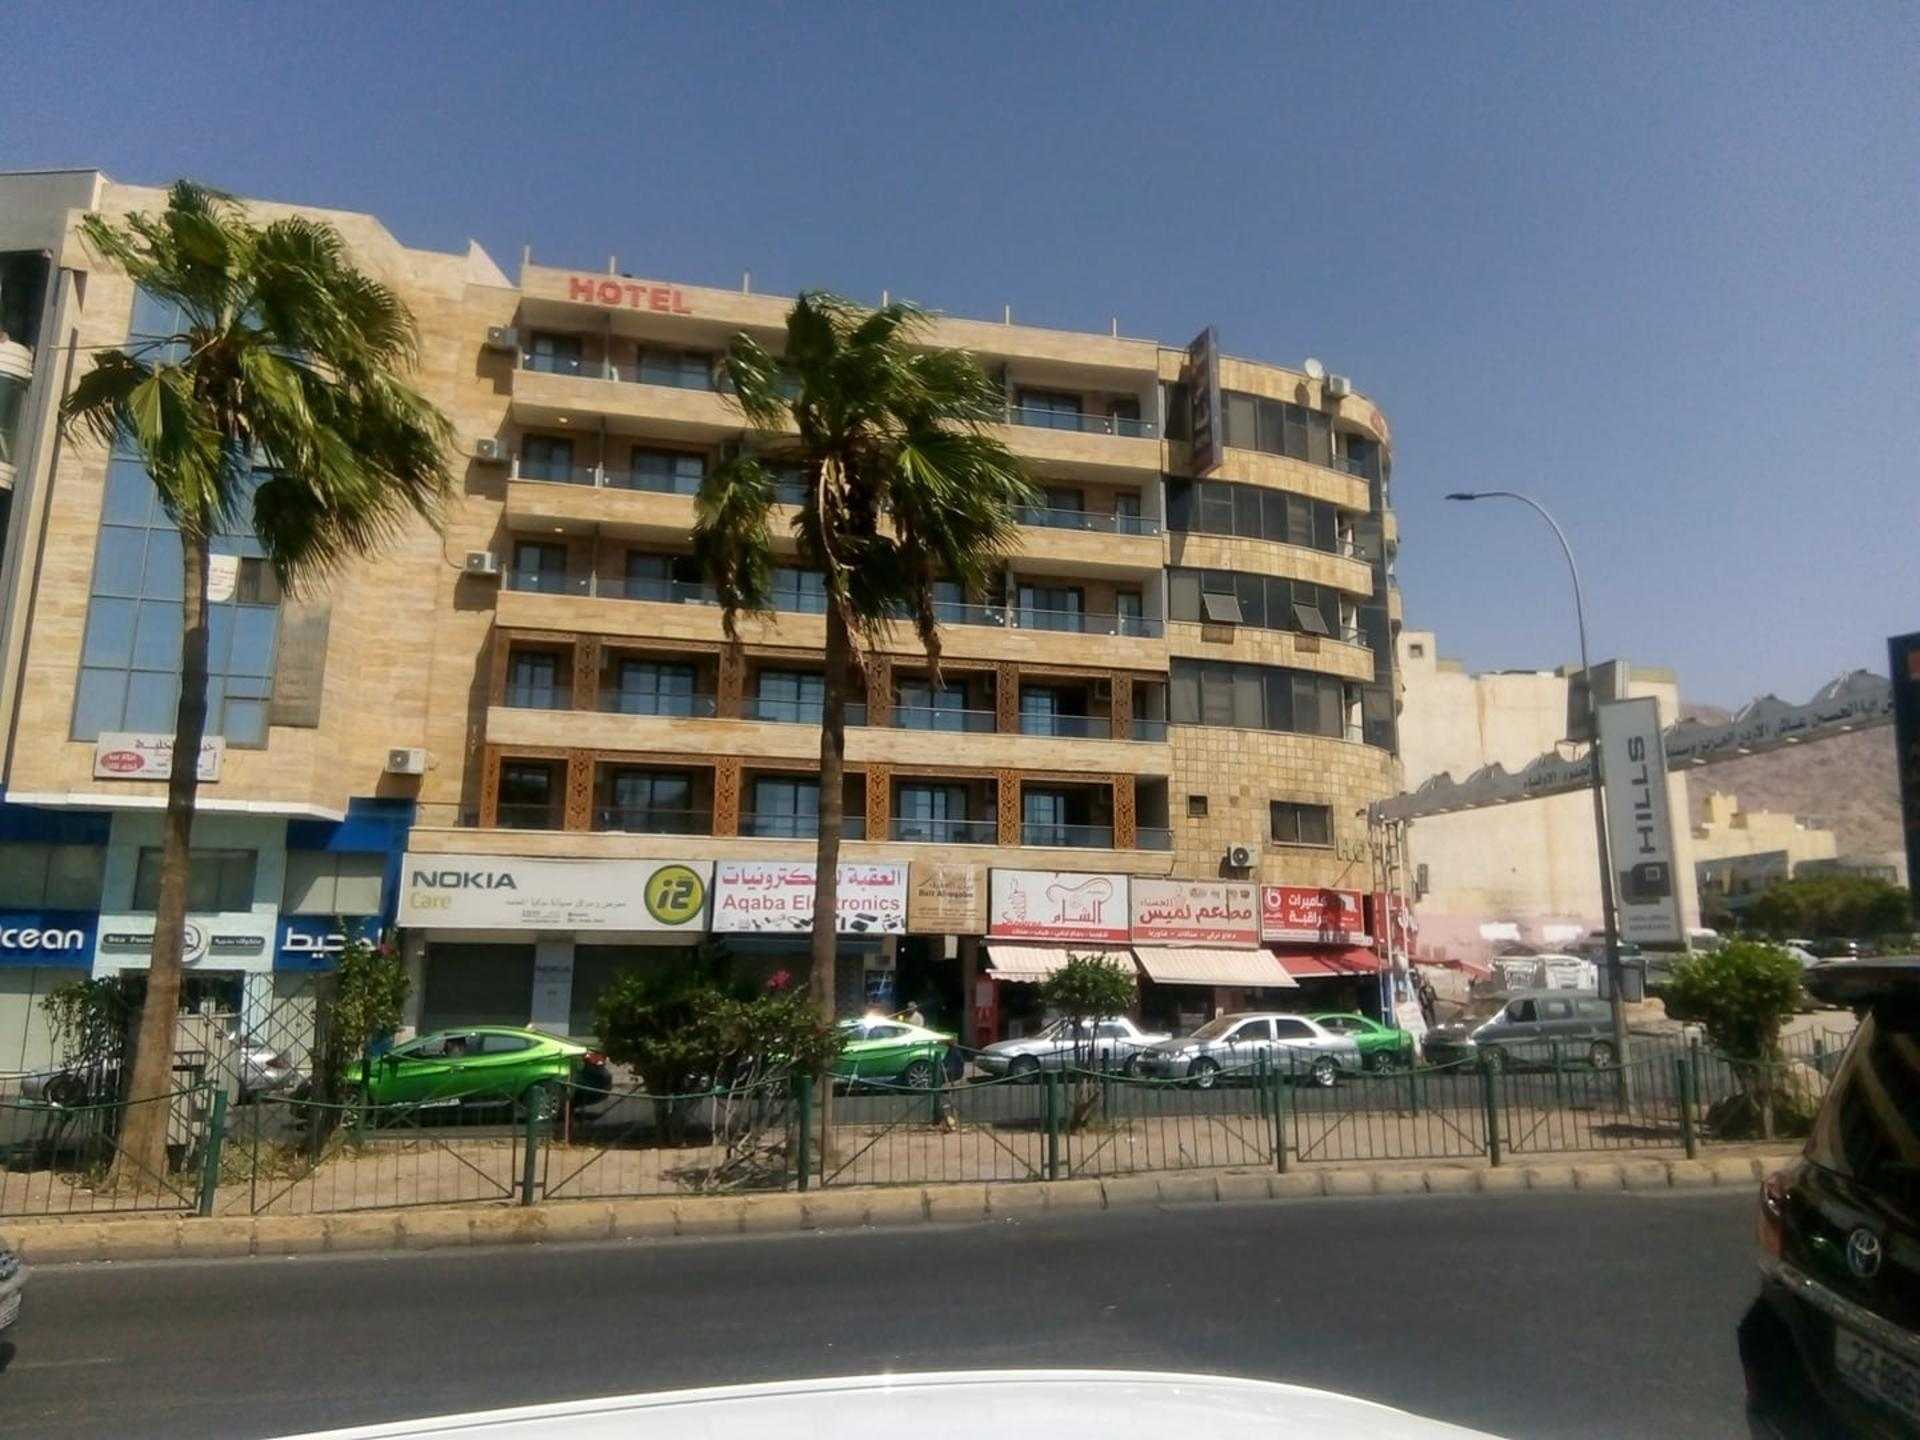 Ahla Tala Hotel